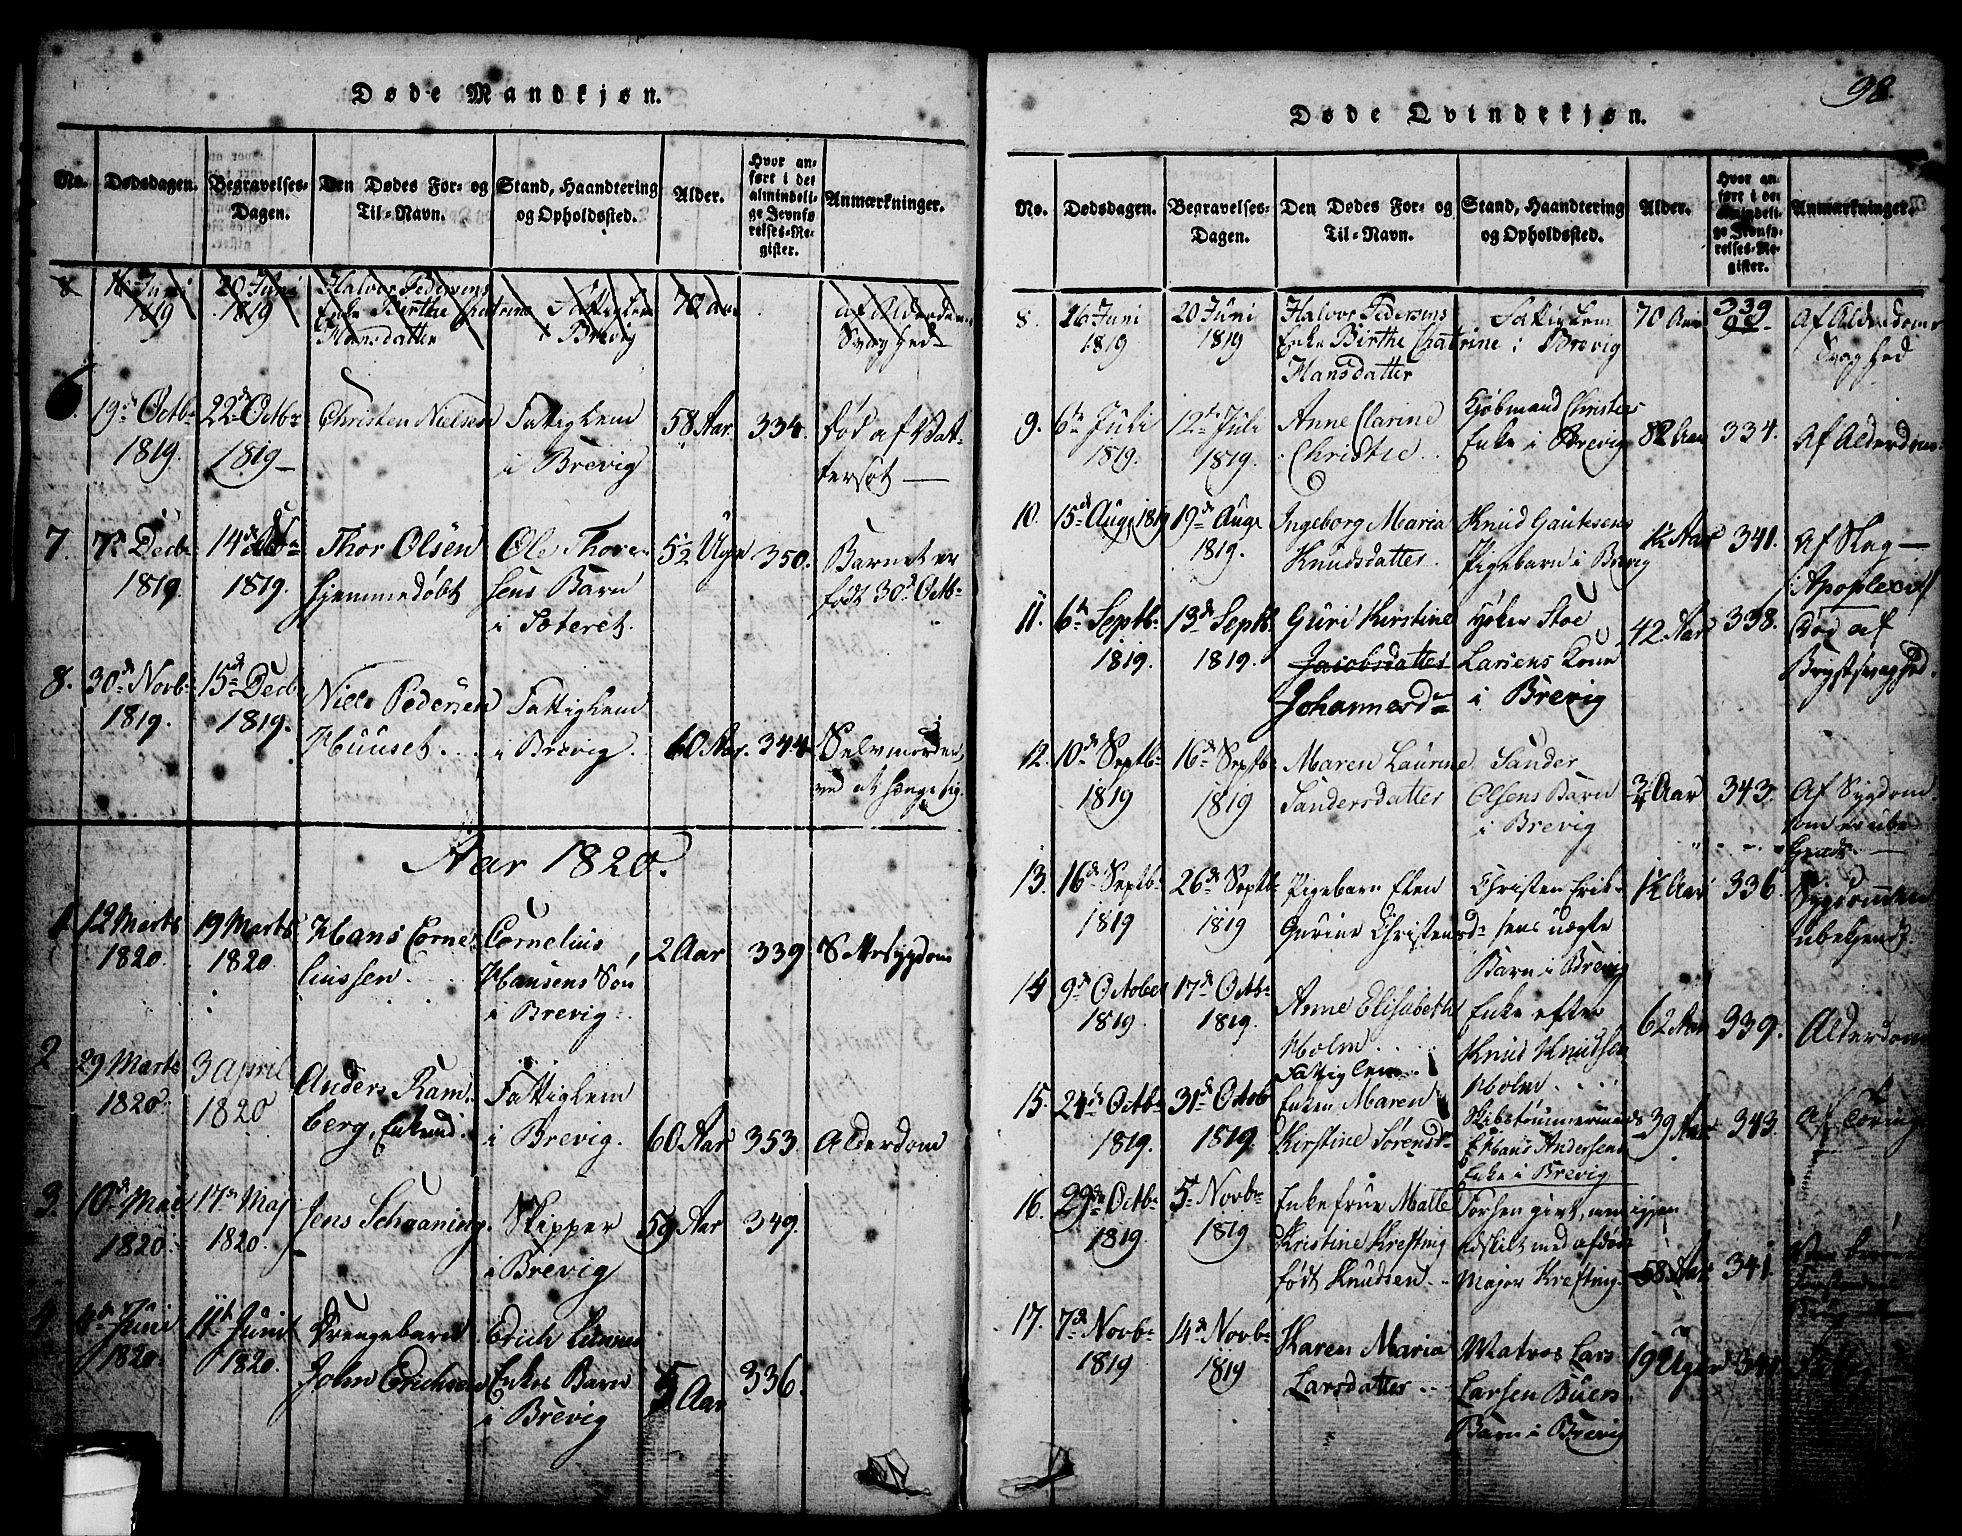 SAKO, Brevik kirkebøker, G/Ga/L0001: Klokkerbok nr. 1, 1814-1845, s. 98